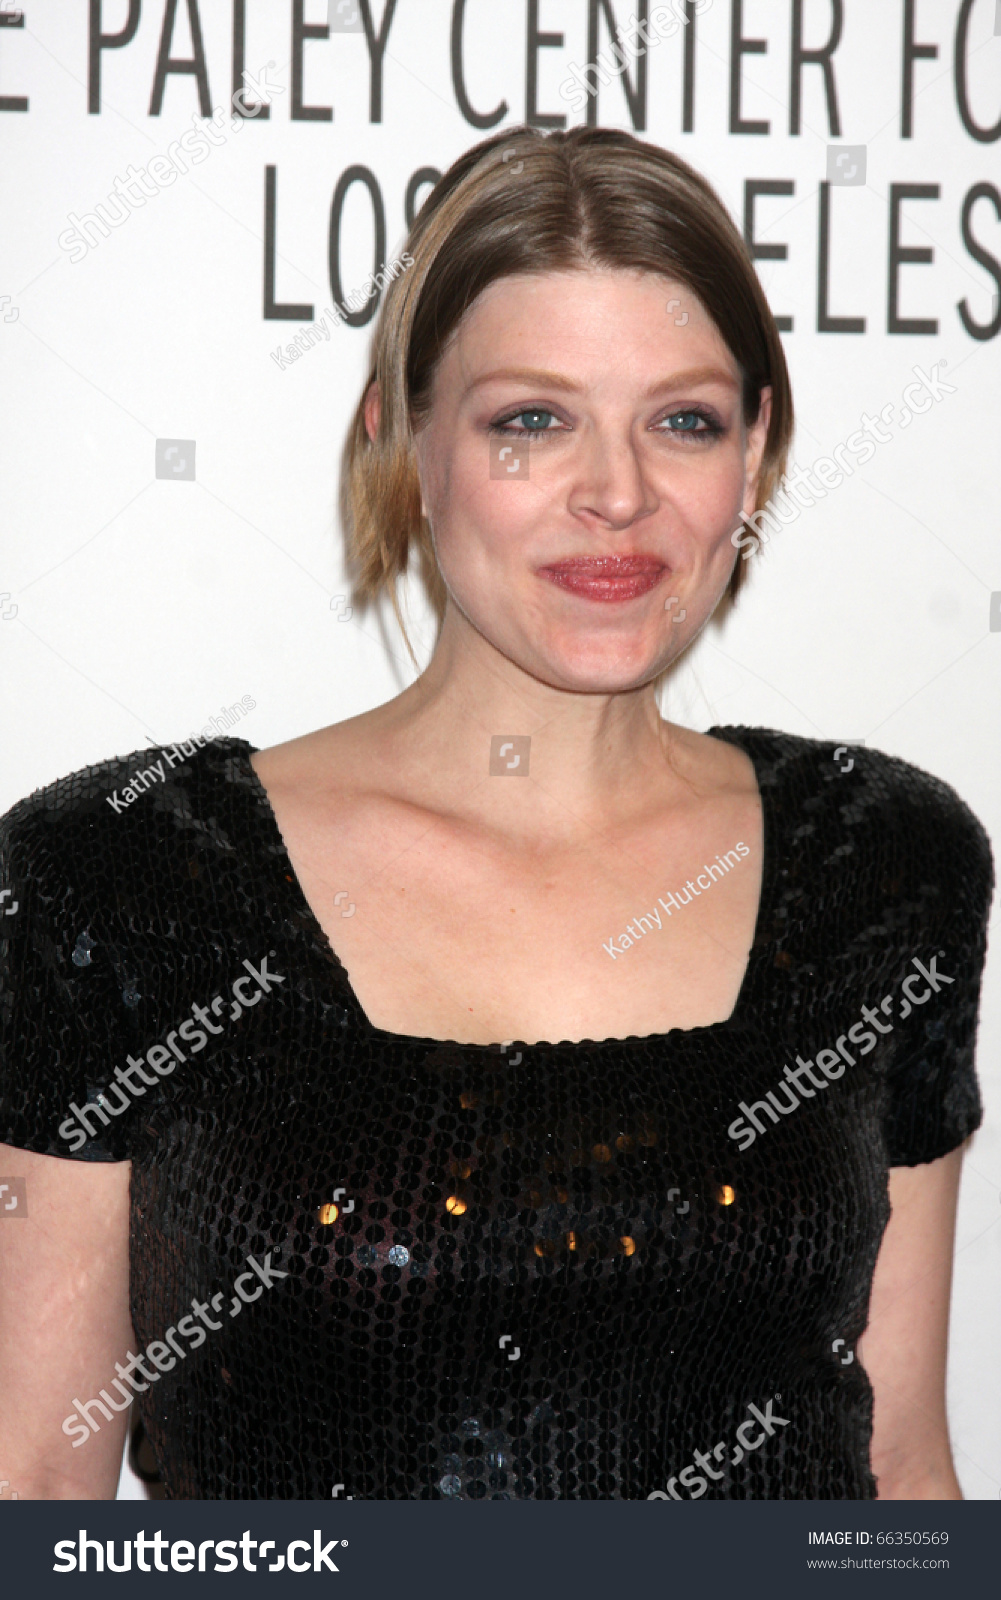 Ella Rattigan USA,Dorothy Johnson (model actress) Hot pics & movies Lucy Russell (actress),Alyson Hannigan born March 24, 1974 (age 44)